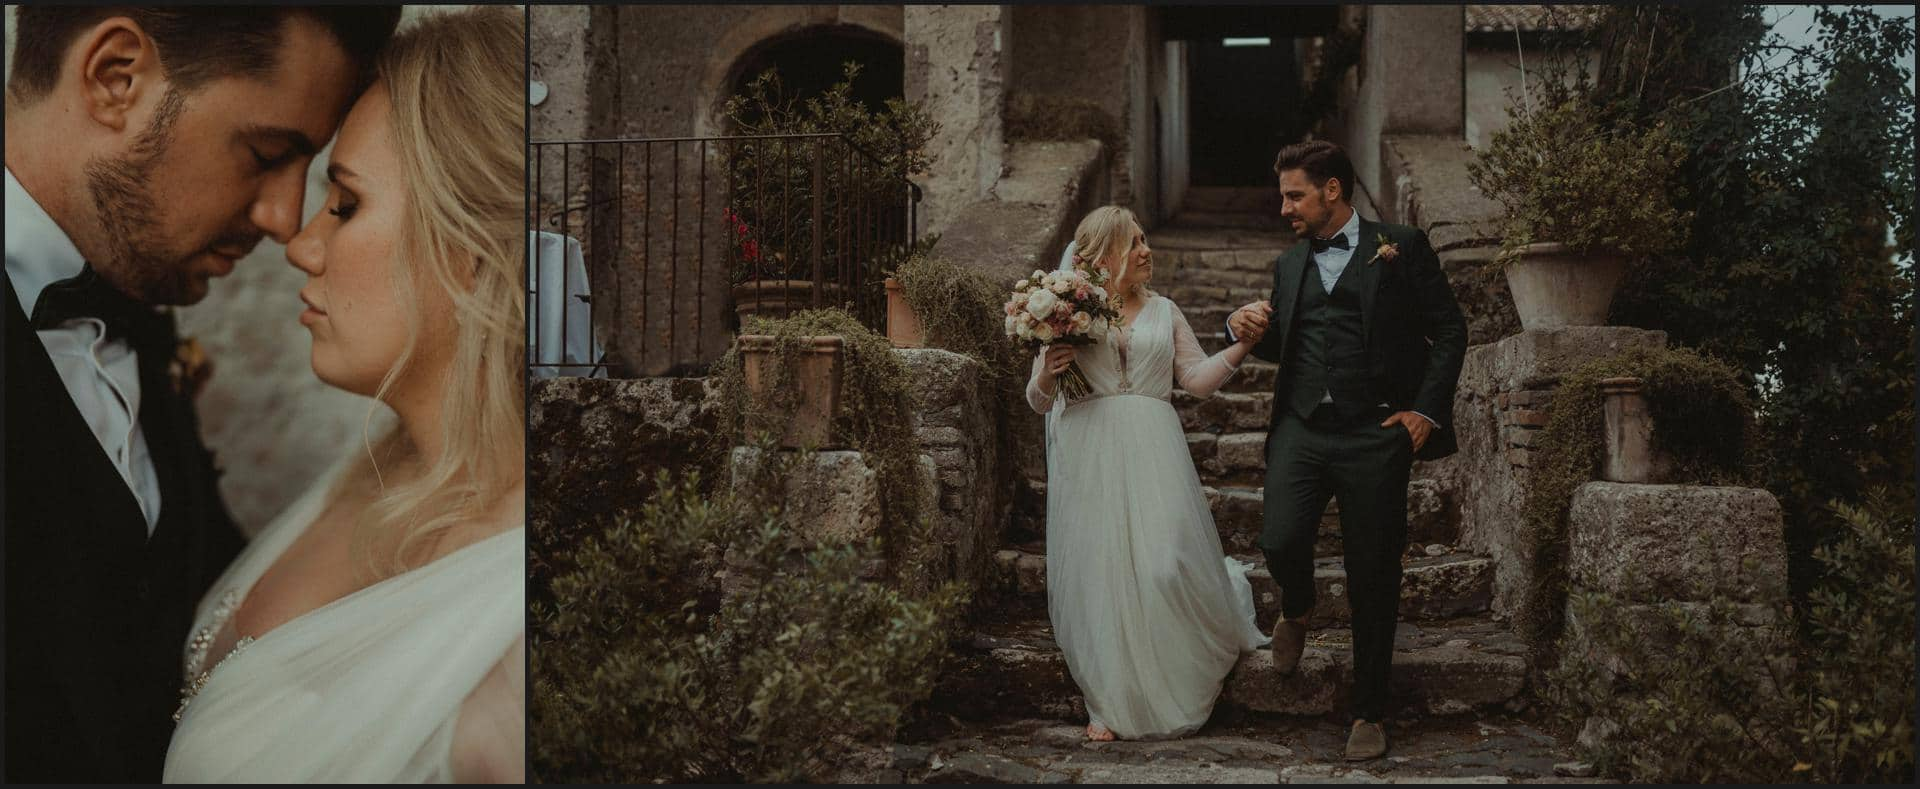 borgo di tragliata, wedding, rome, wedding in rome, destination wedding, rome wedding photographer, intimate wedding, bride, groom, wedding dress